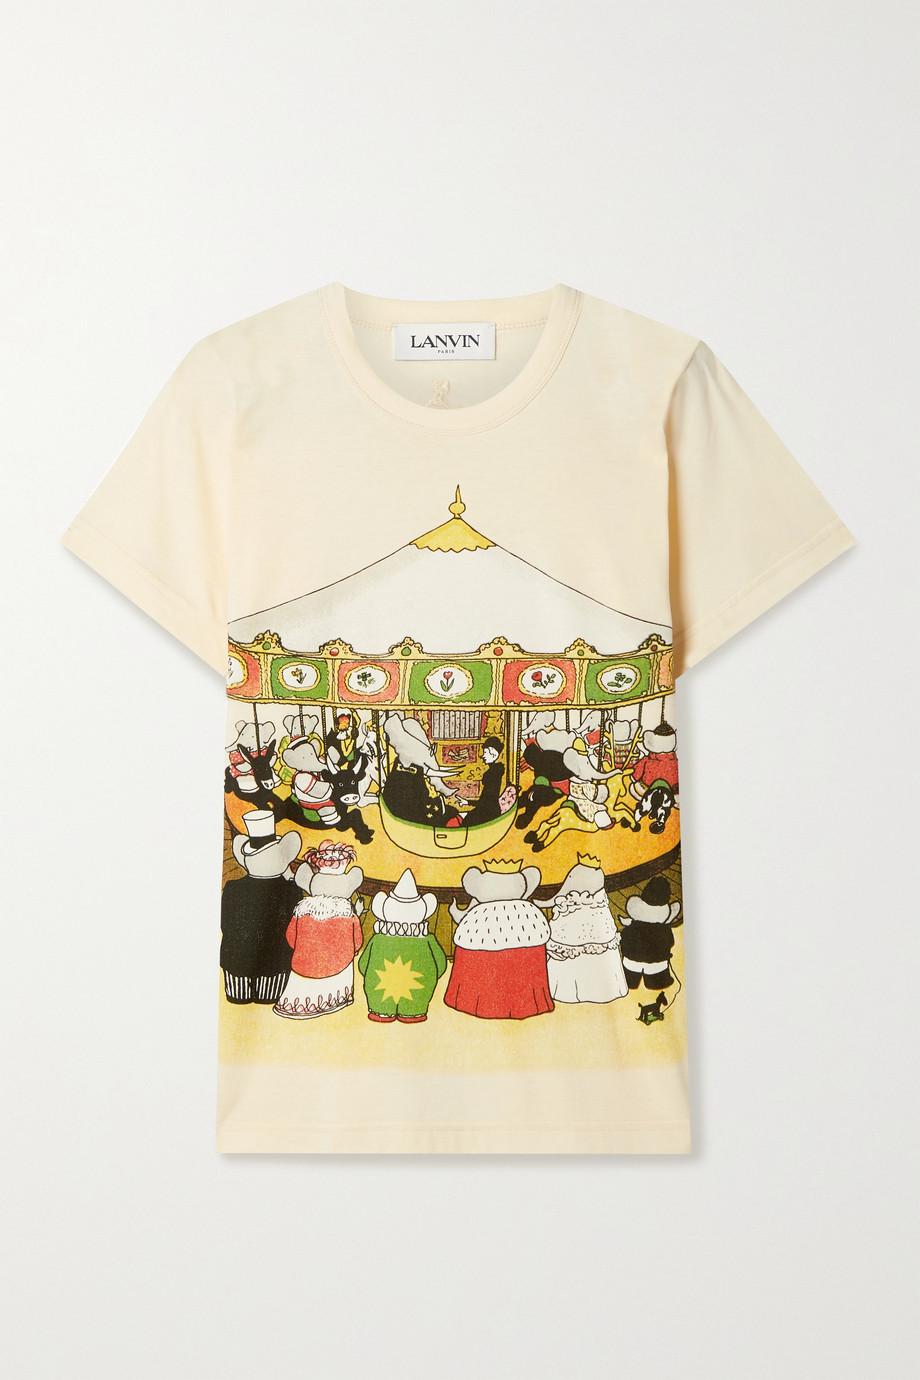 Lanvin x Babar 印花纯棉平纹布 T 恤